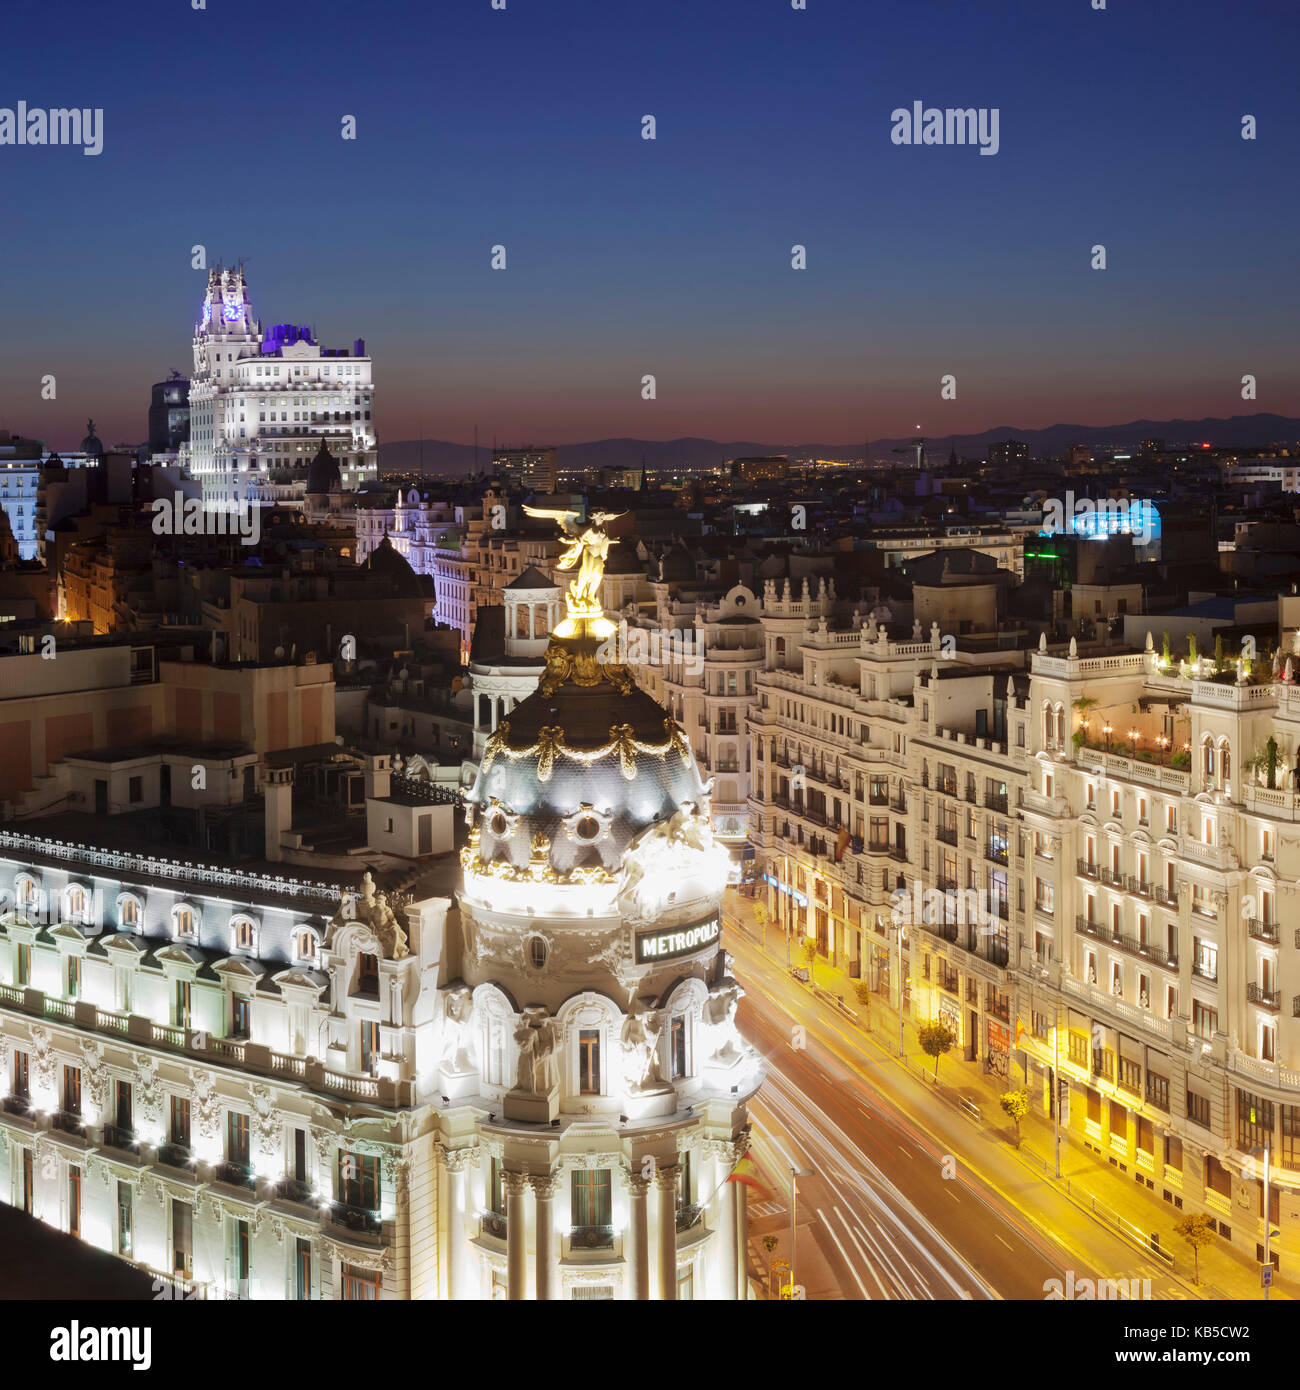 Edificio Metropolis, Architect Jules and Raymond Fevrier, Calle de Alcana, Madrid, Spain, Europe - Stock Image